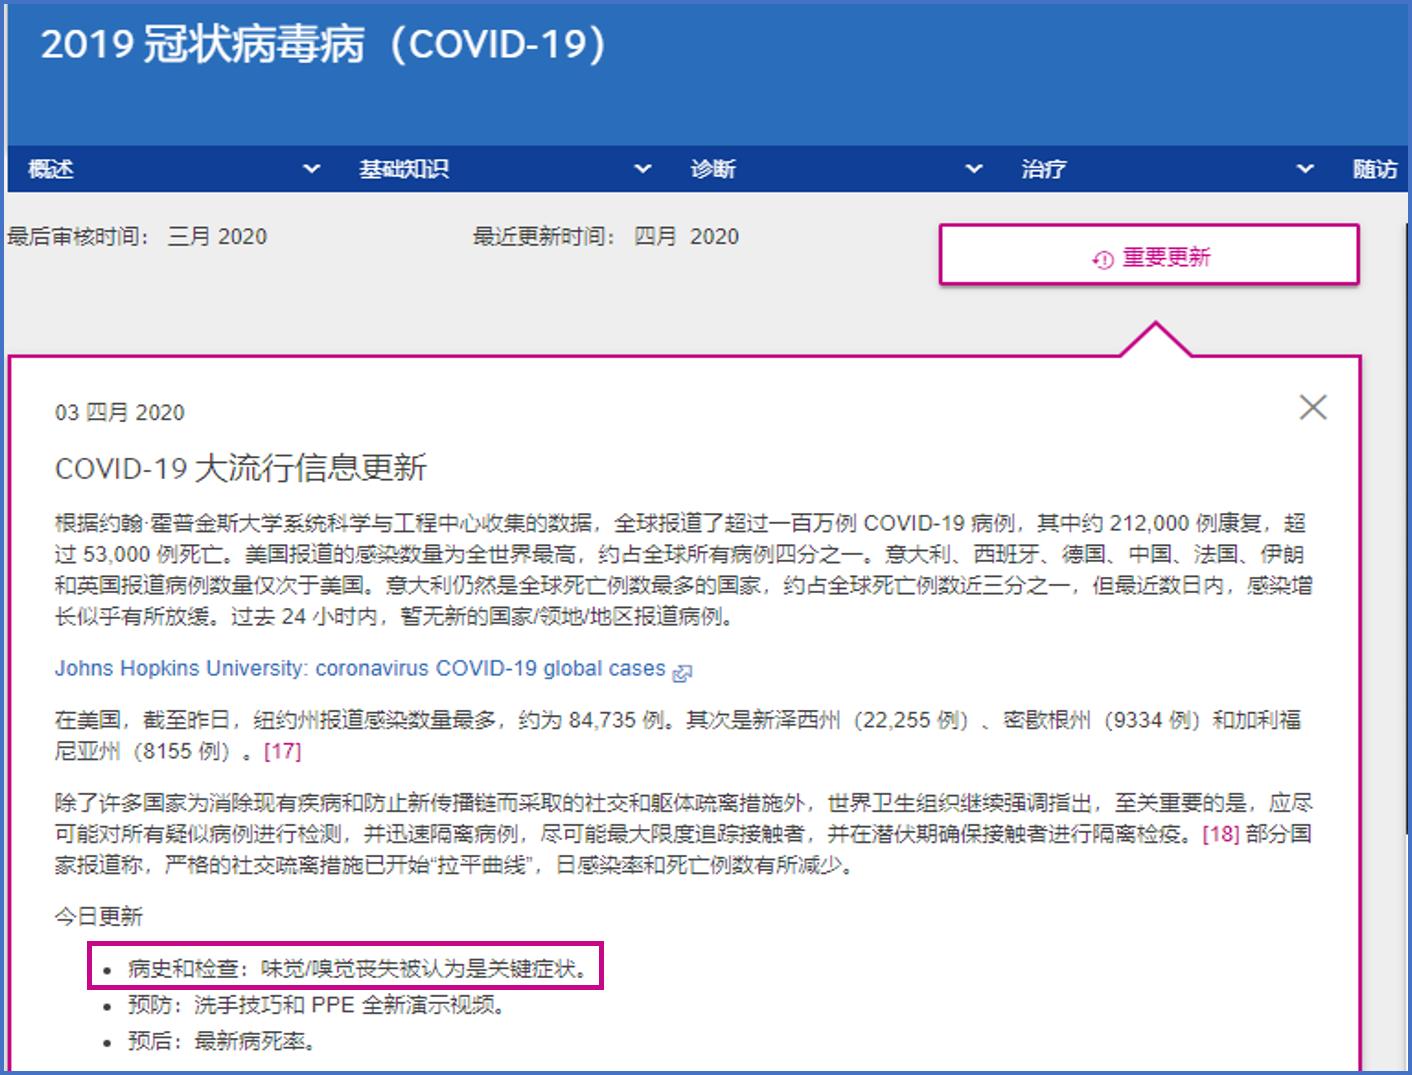 BMJ Best Practice 更新提示:嗅觉 / 味觉丧失为 COVID-19 关键症状